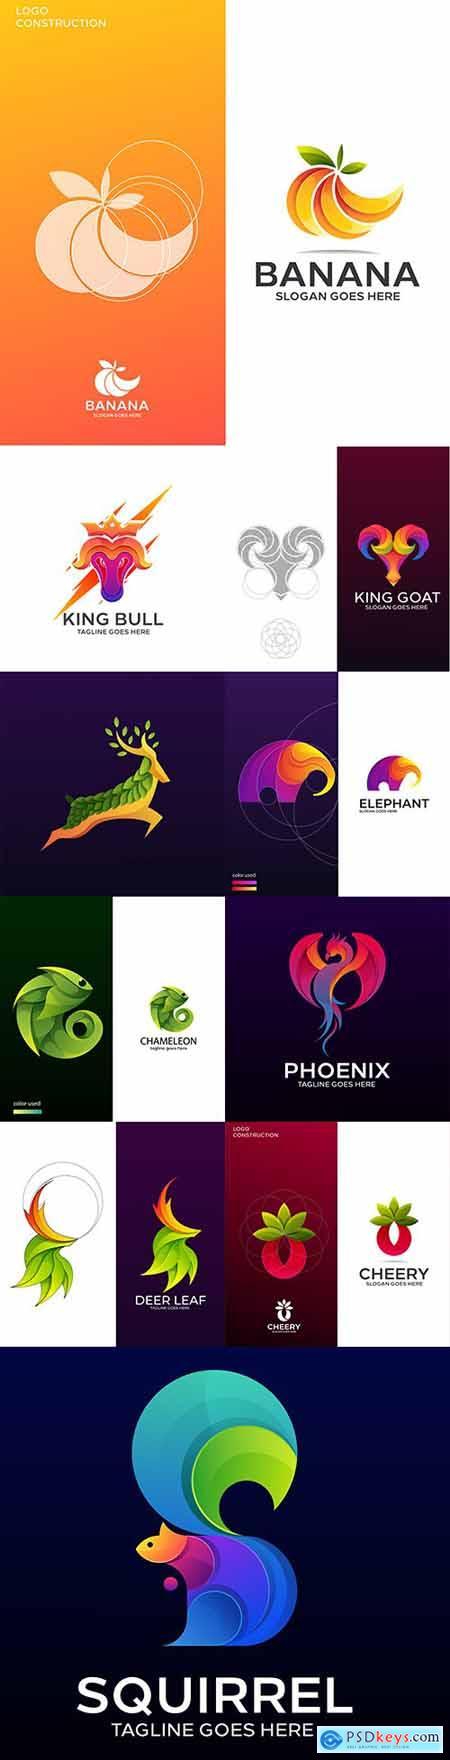 Brand name company logos business corporate design 78